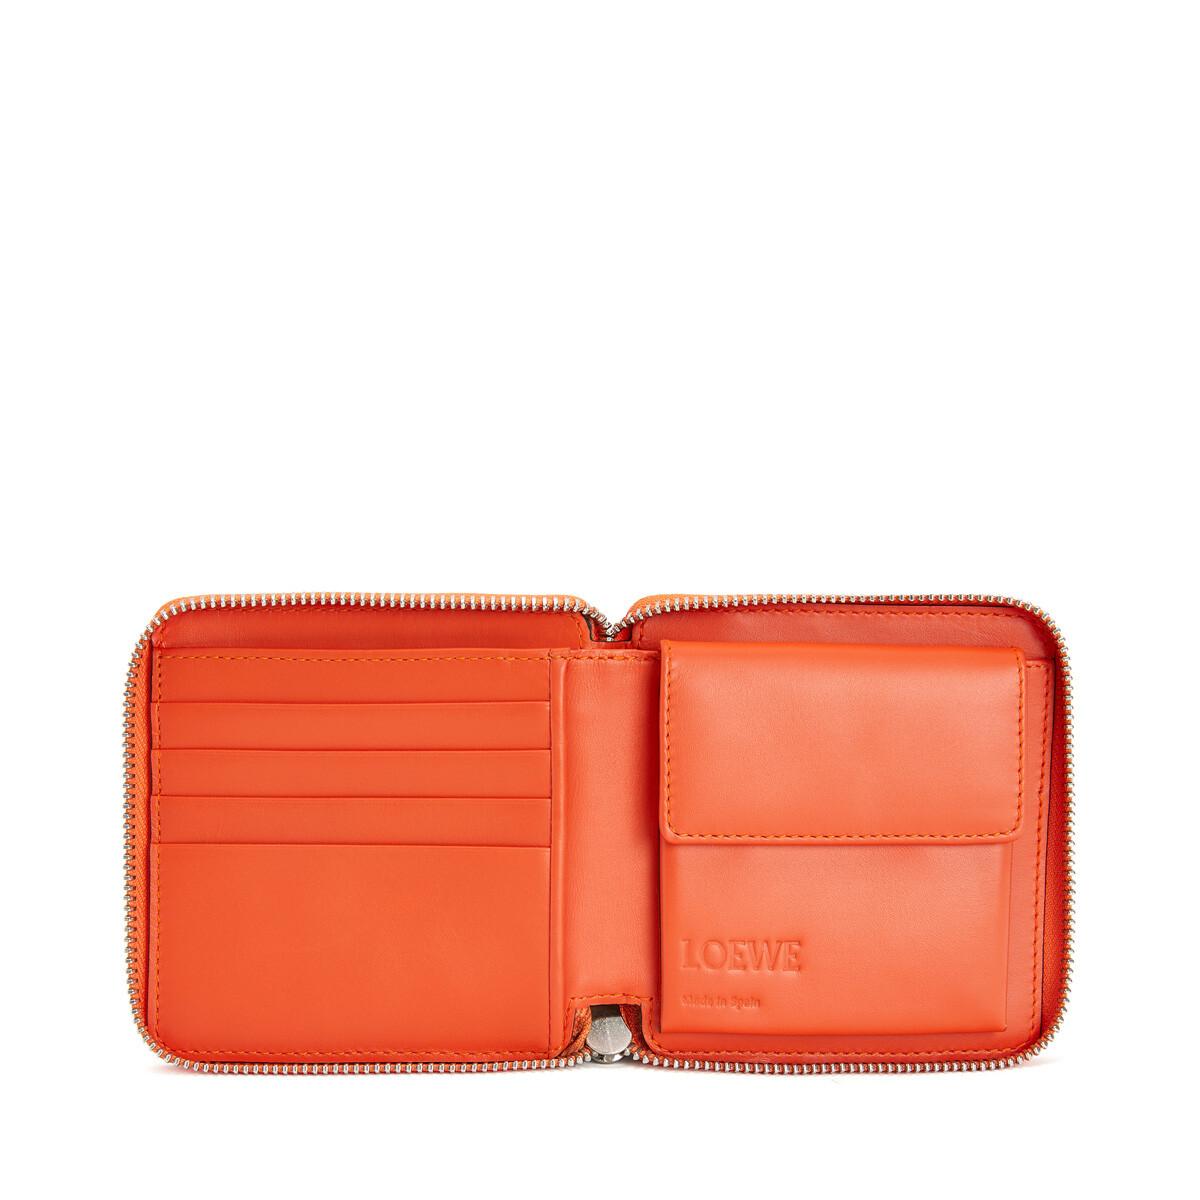 LOEWE メイズスクエアジップウォレット Tan/Orange front